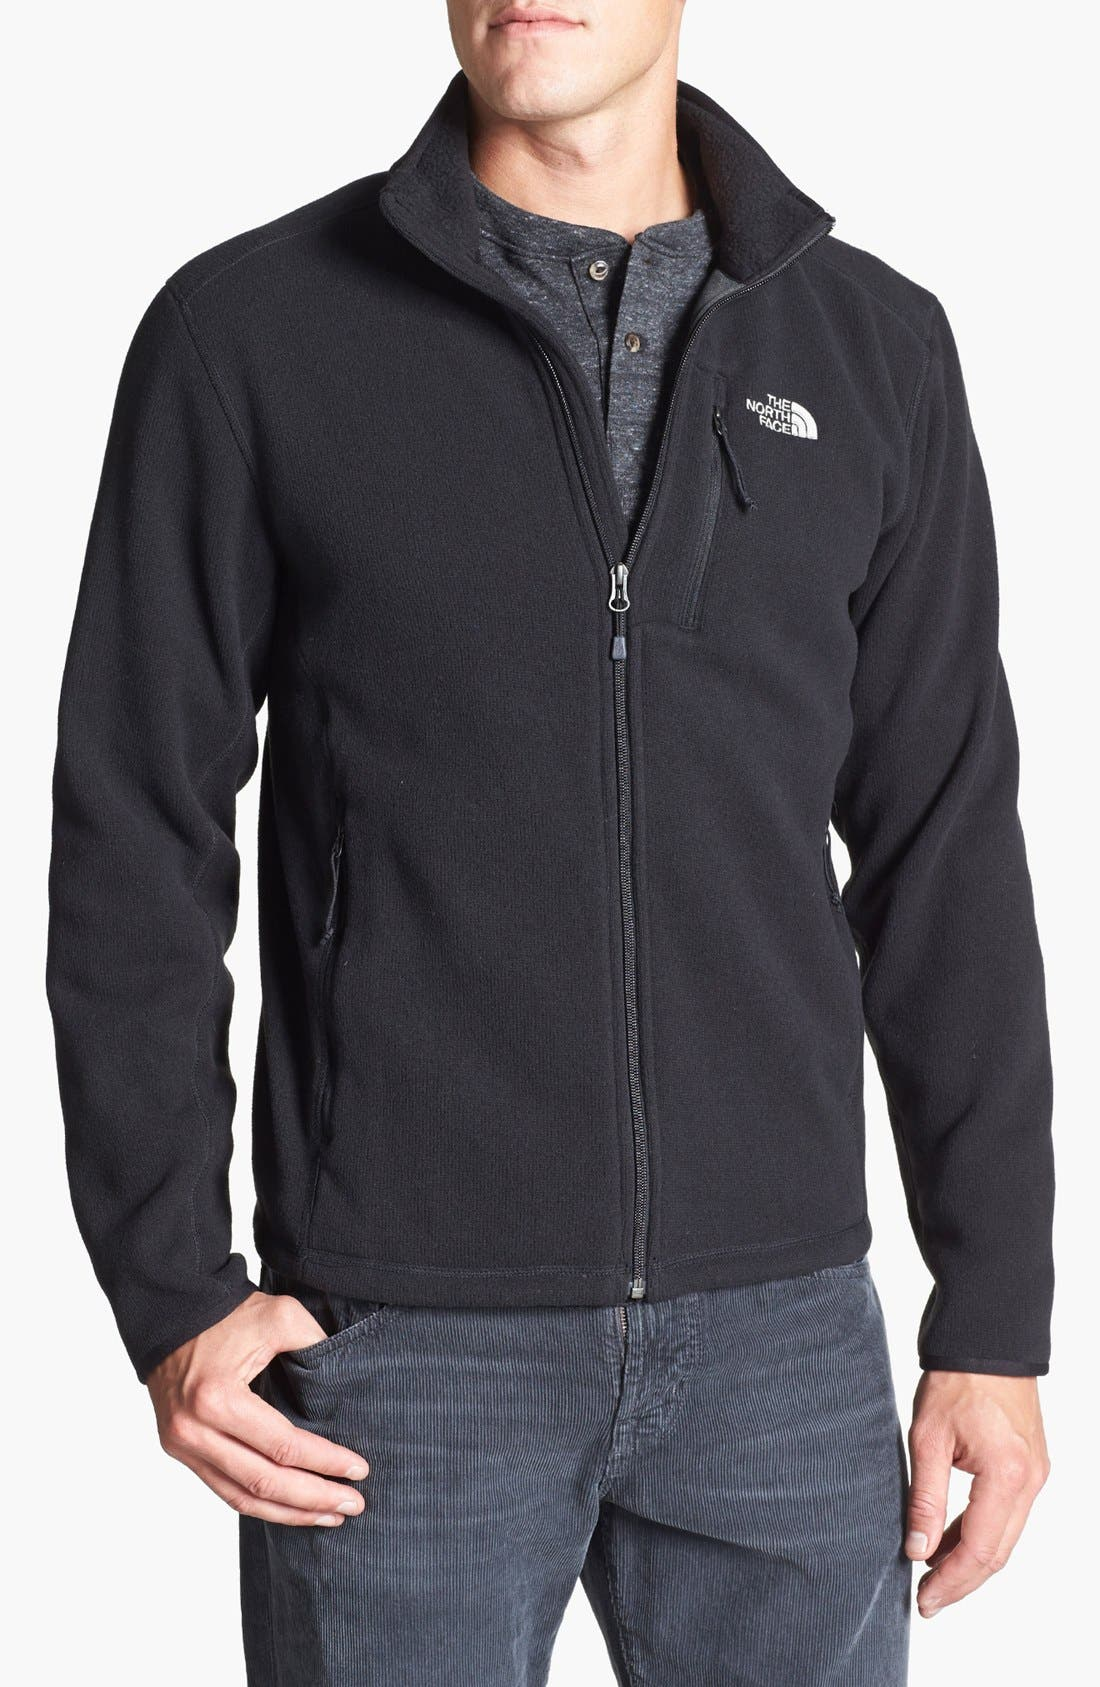 Main Image - The North Face 'Gordon Lyons' Sweater Knit Fleece Jacket